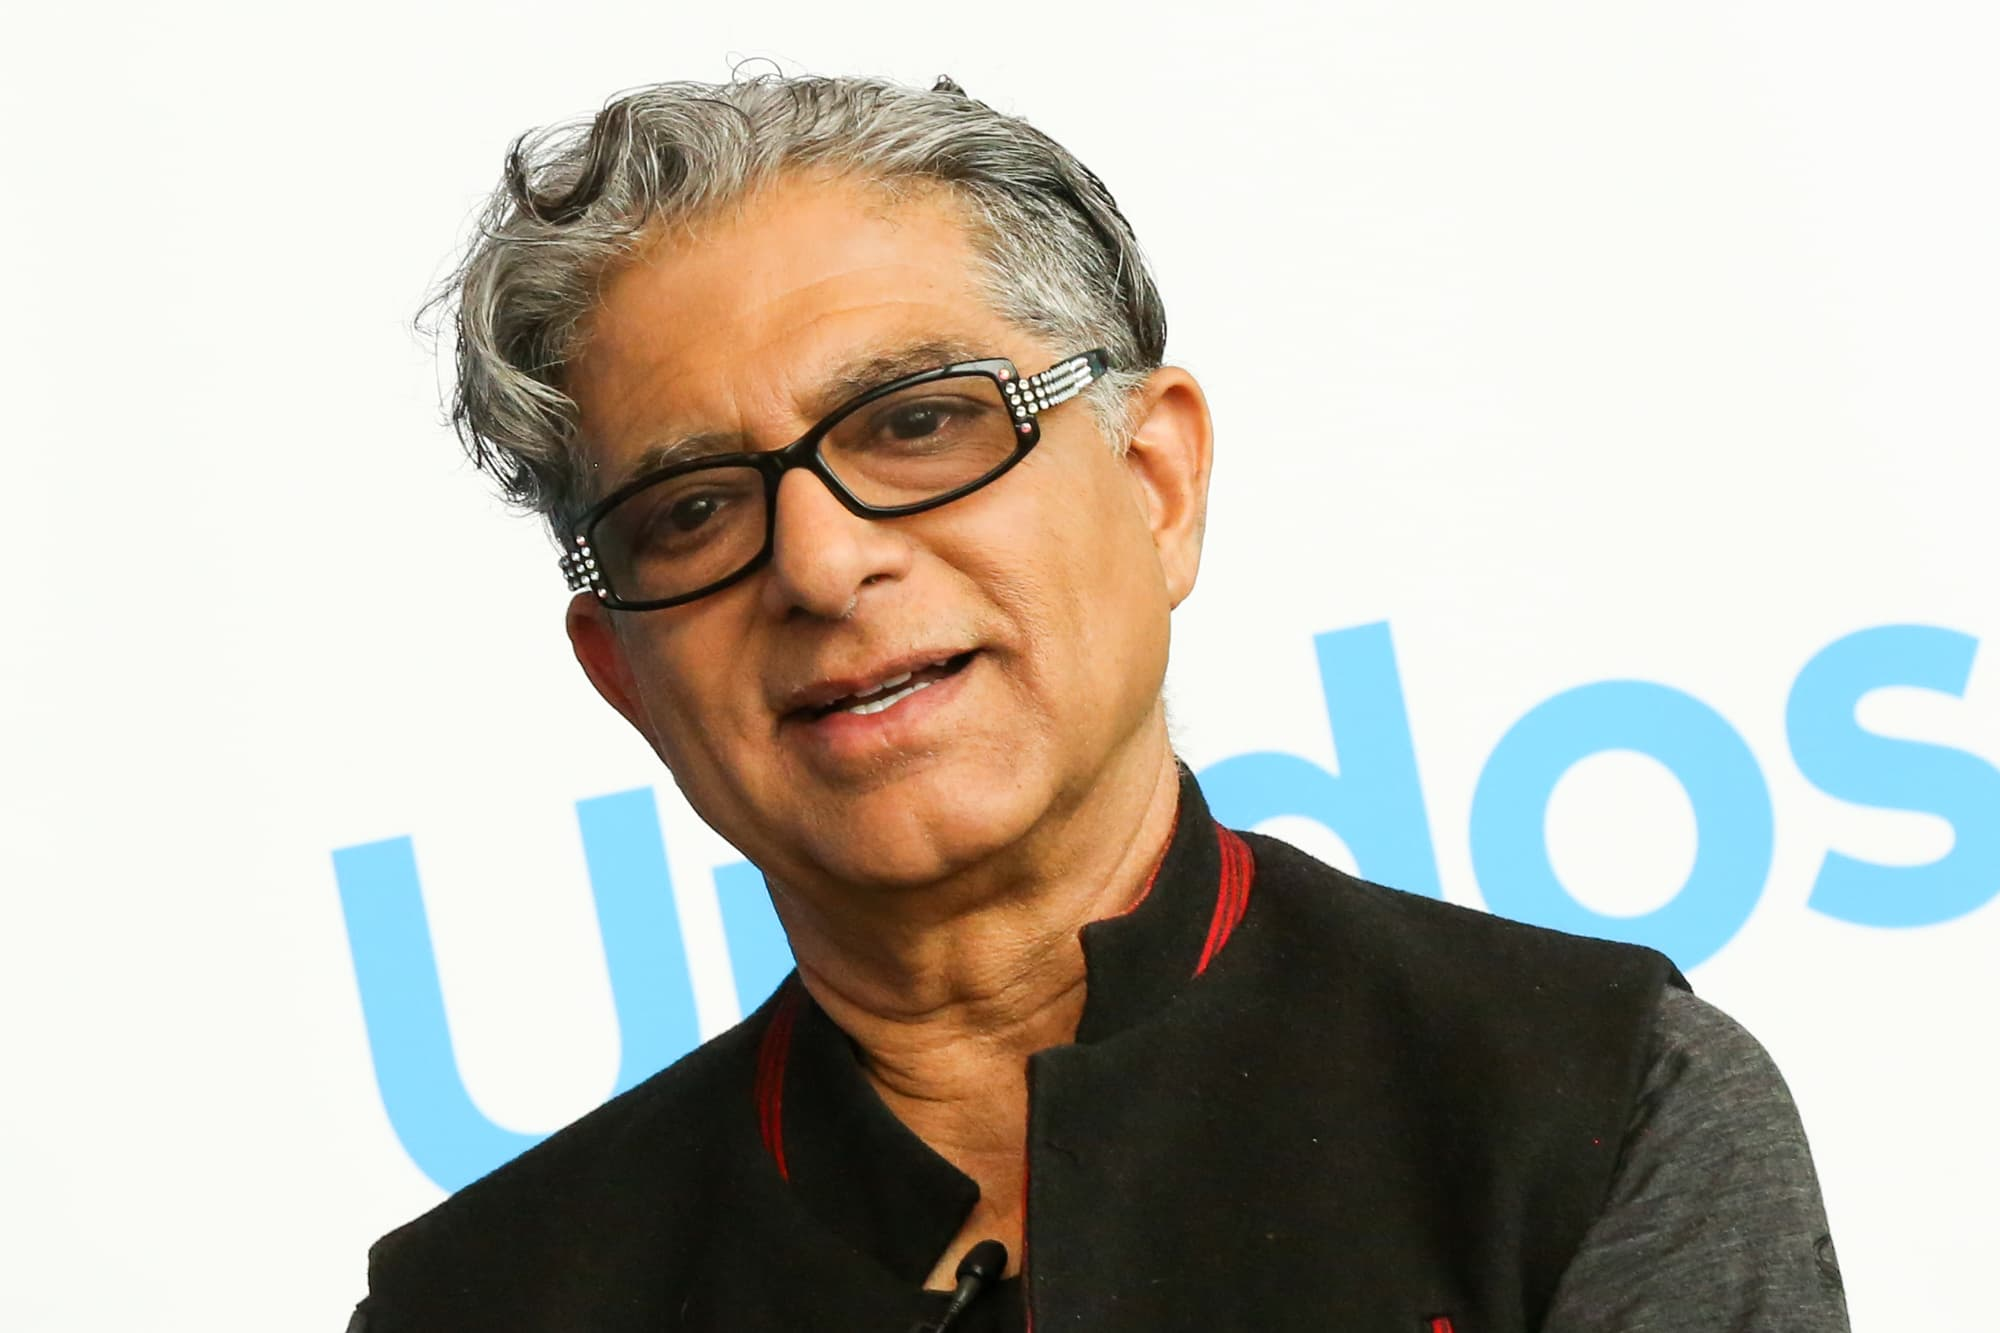 Deepak Chopra warns of disaster unless people address their well-being